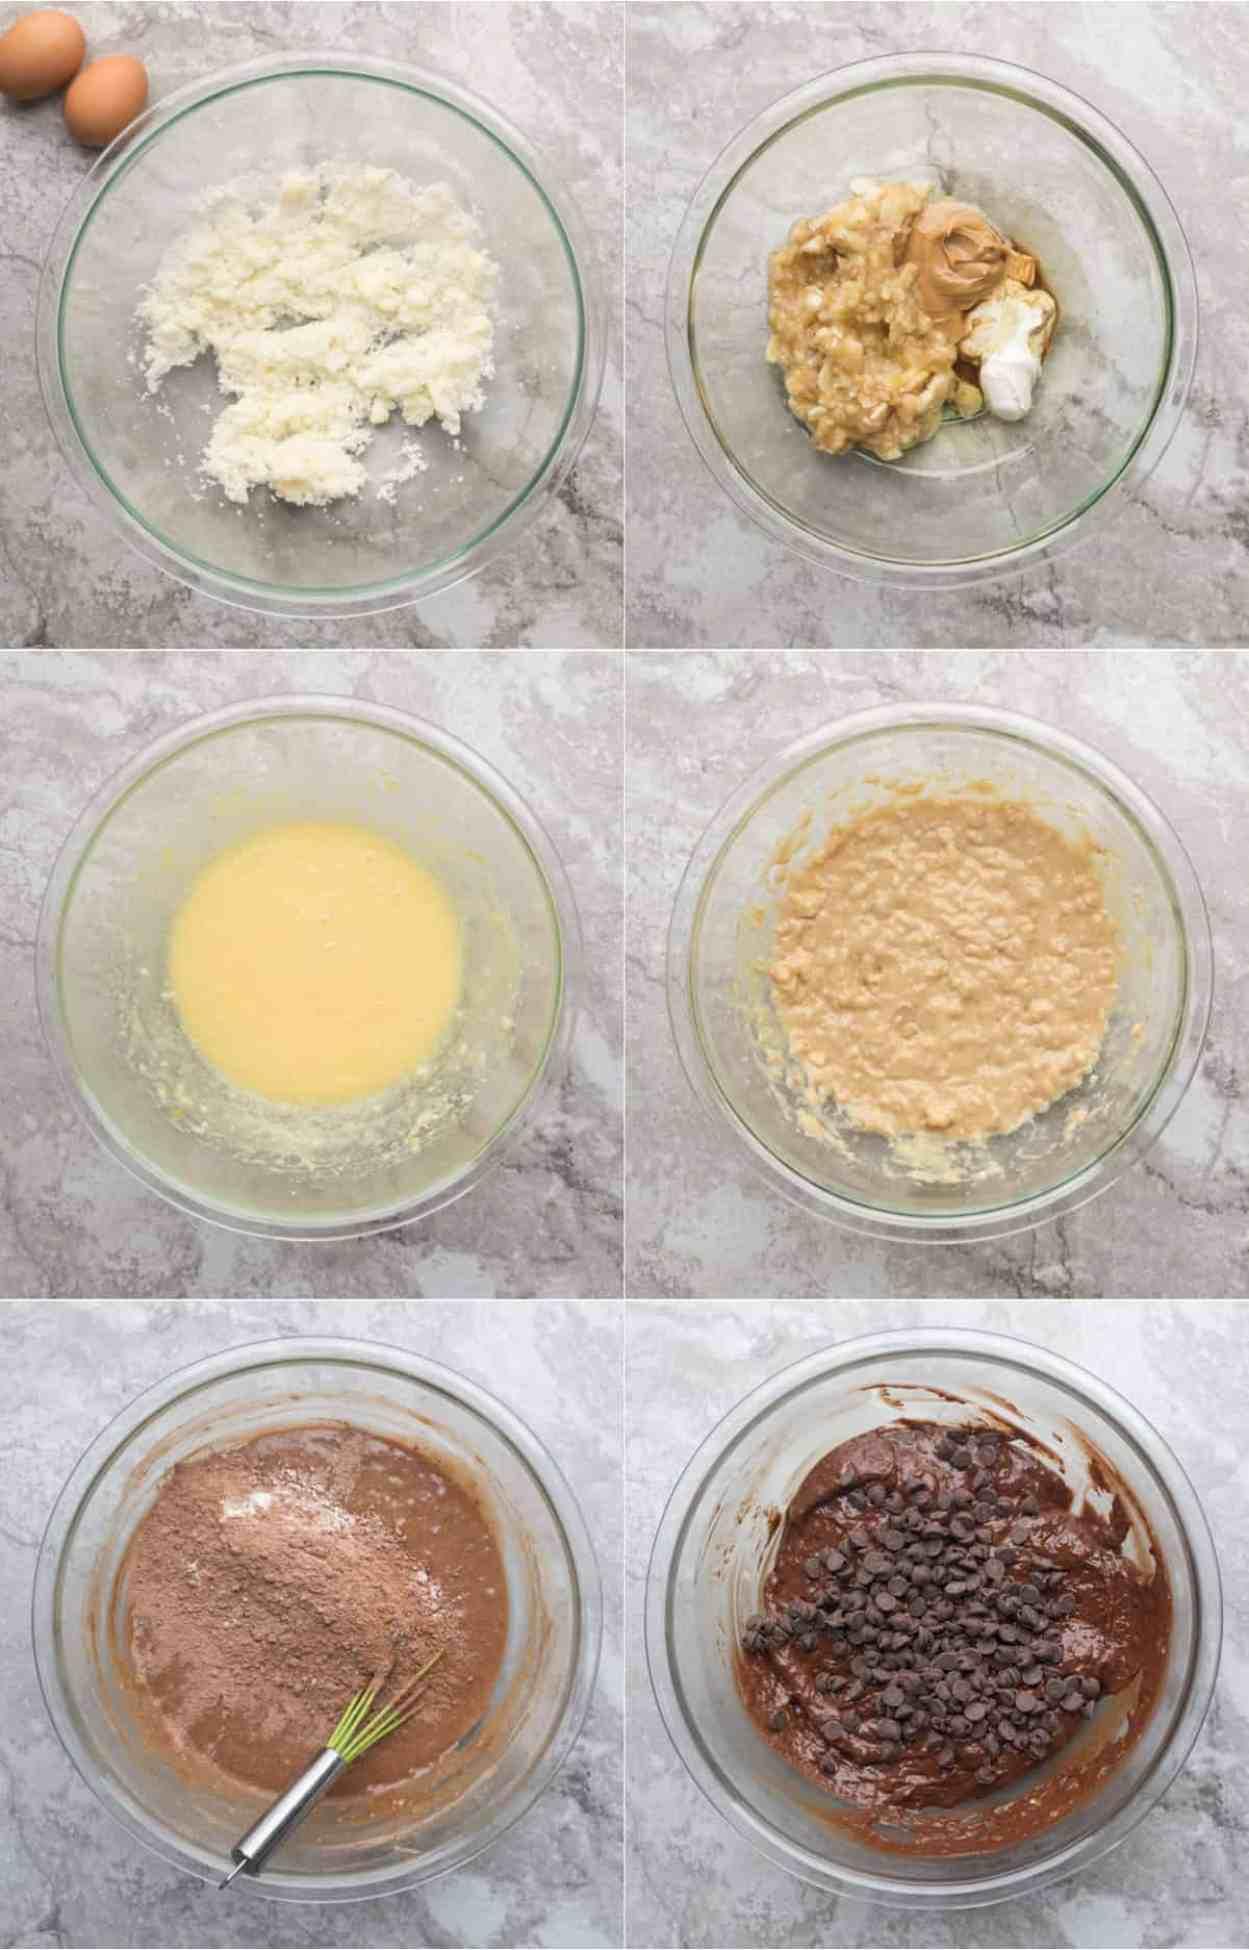 How to make chocolate chip banana bread recipe batter.